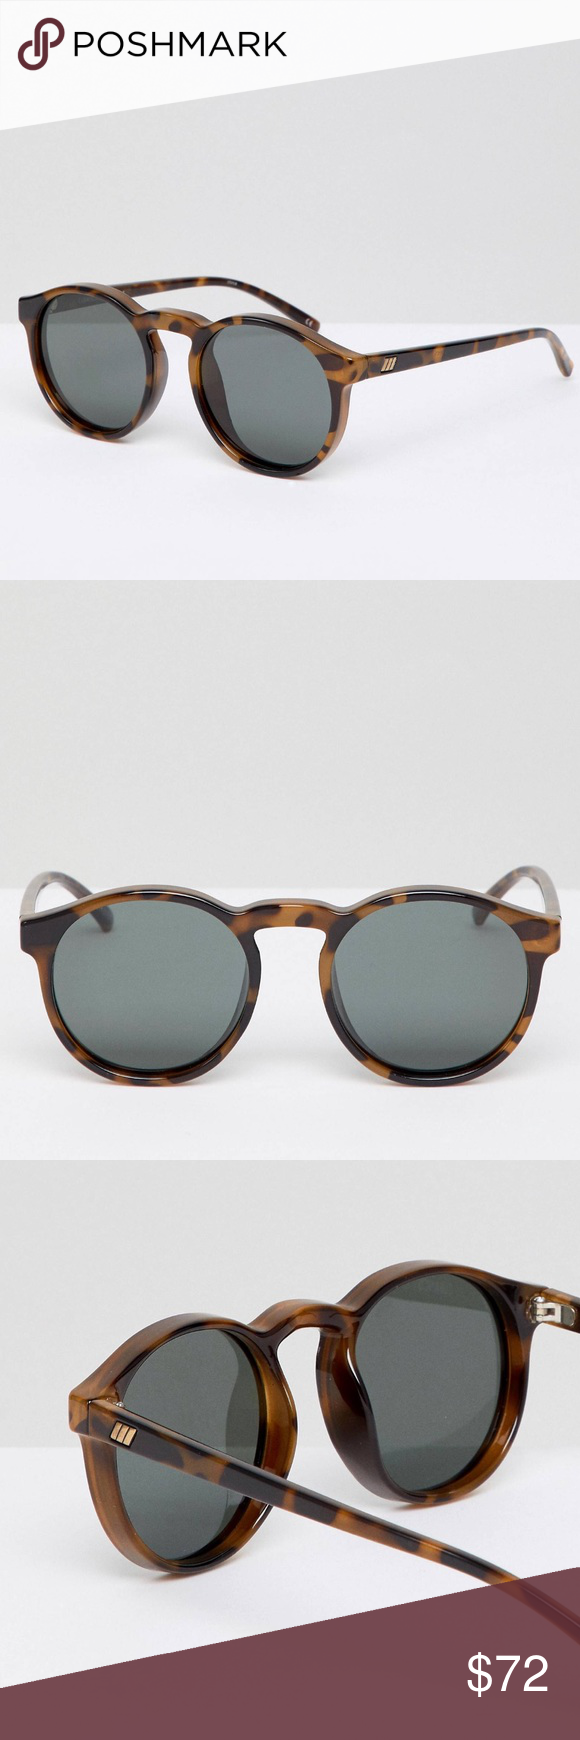 868692ae84c Le Specs Round Polarized Sunglasses Milky Tort Brand new! Cubanos sunglasses  tortoise black brown Le Specs Accessories Sunglasses